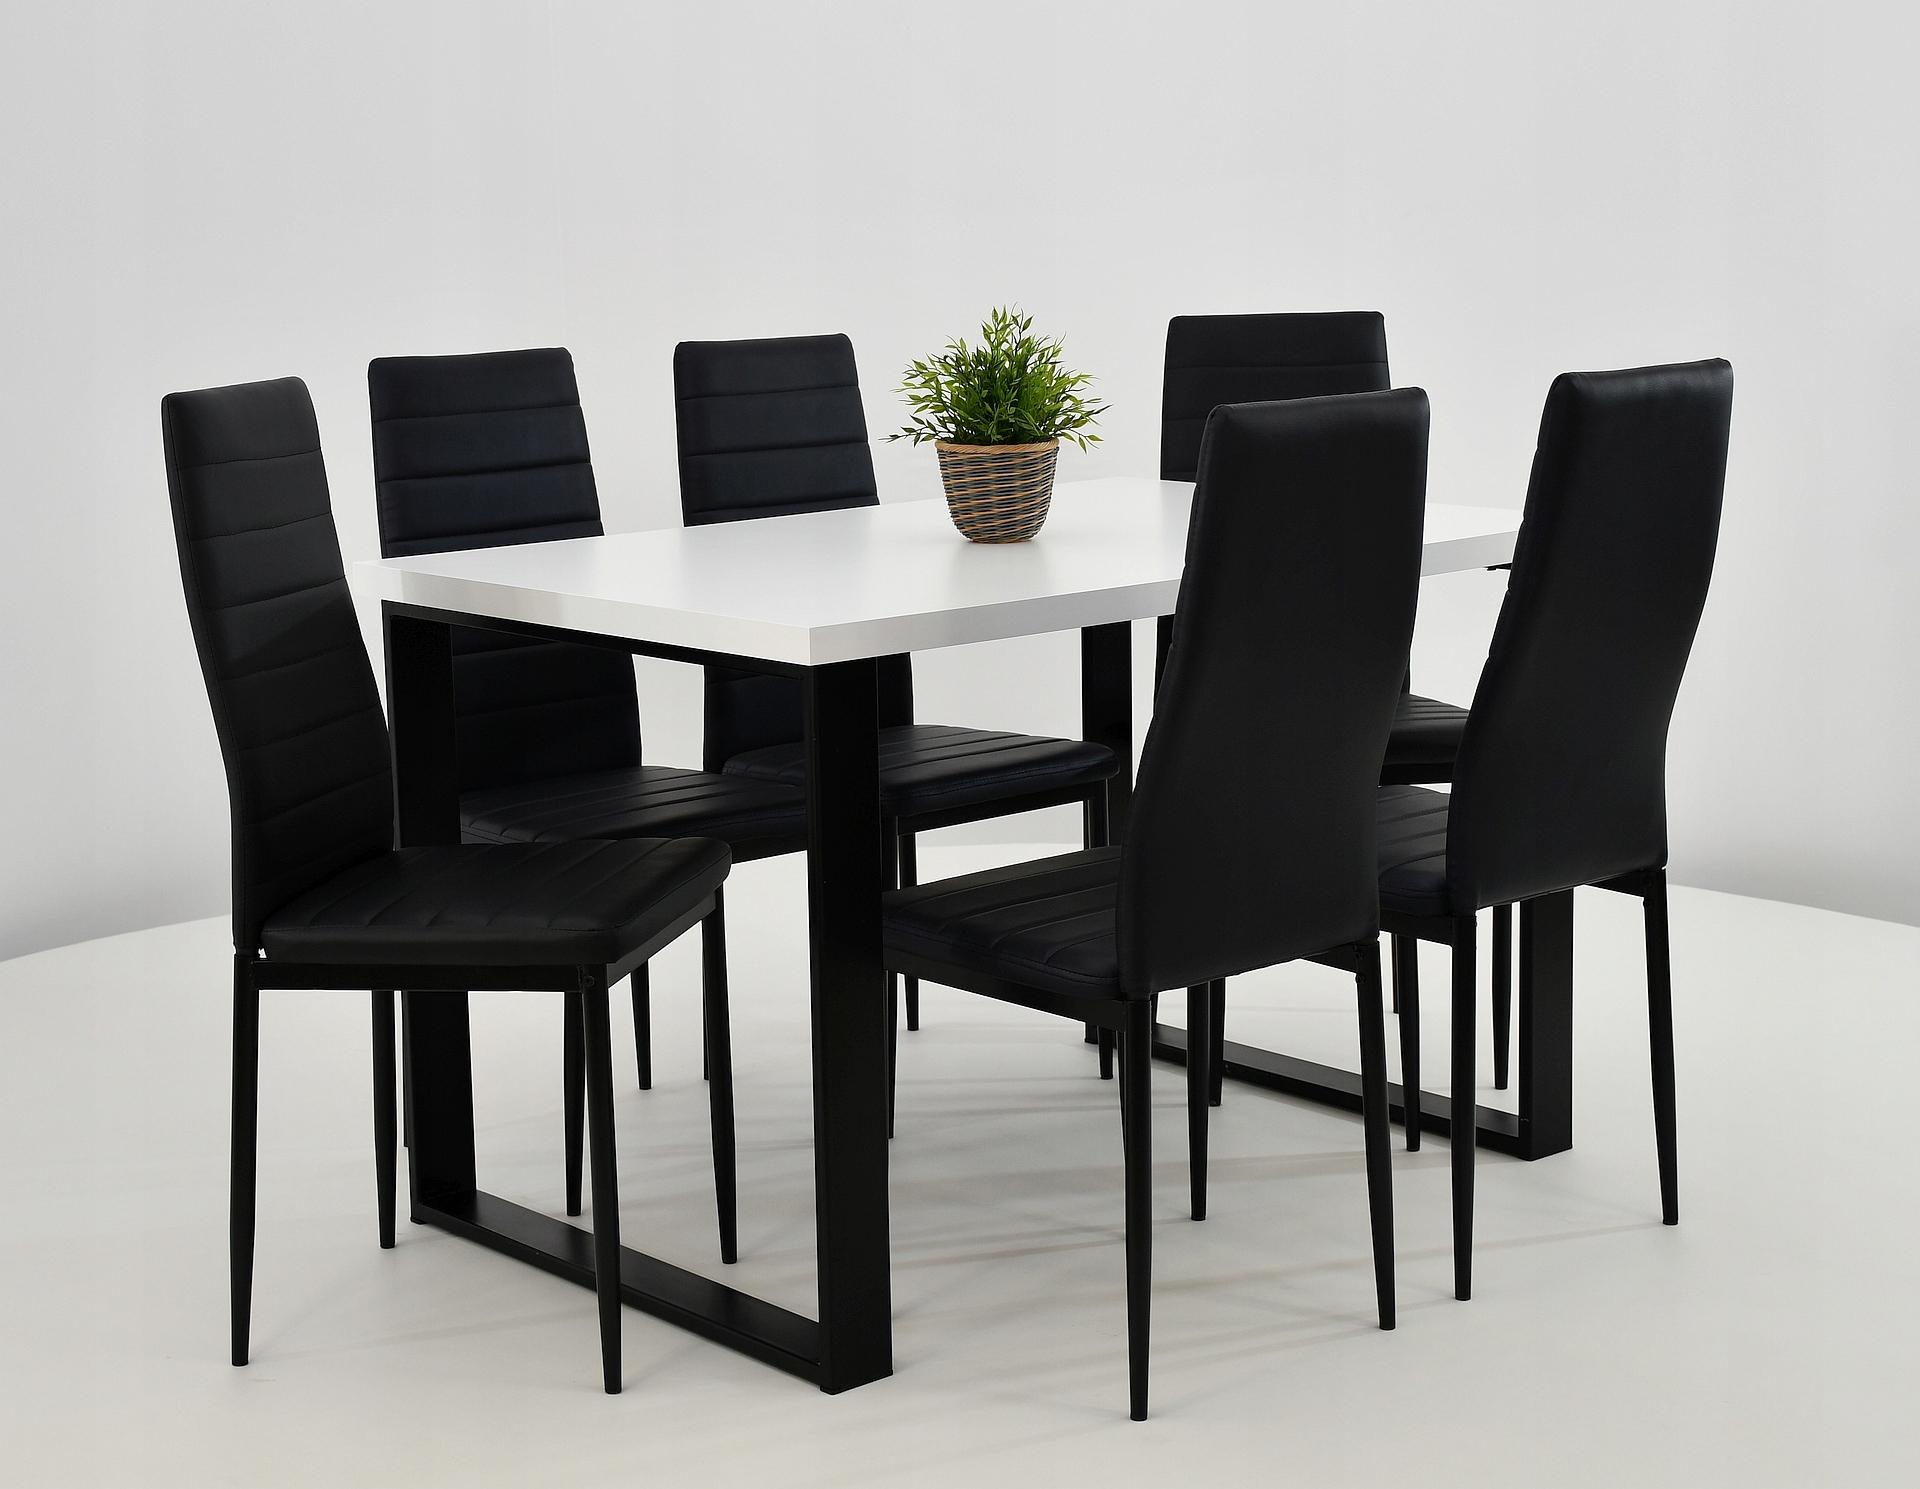 6 stoličkami pre kuchyňa + loftowy tabuľka 80x120